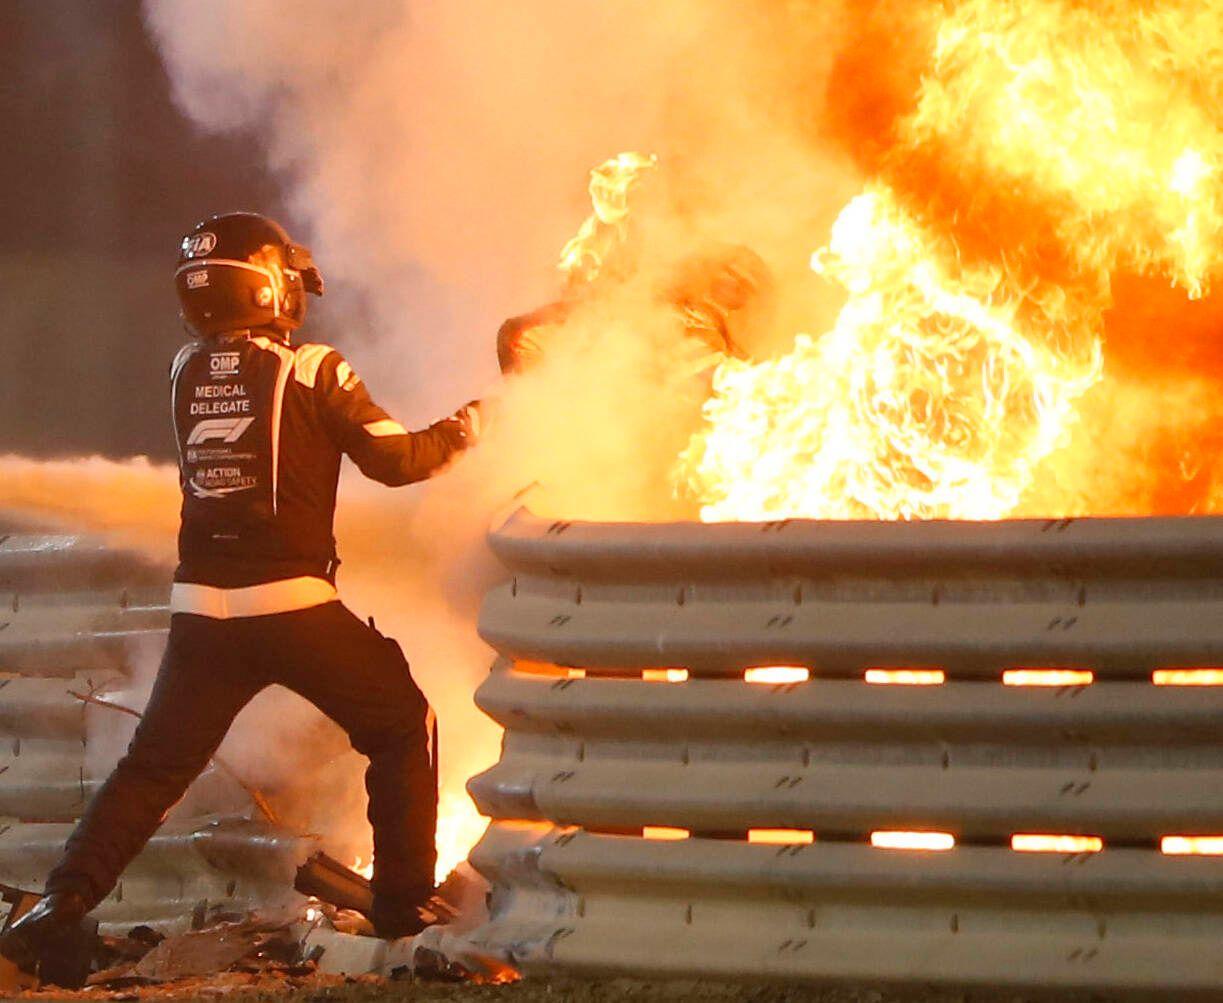 2020 Bahrain GP BAHRAIN INTERNATIONAL CIRCUIT, BAHRAIN - NOVEMBER 29: Medical deligate pulls Romain Grosjean, Haas F1 f